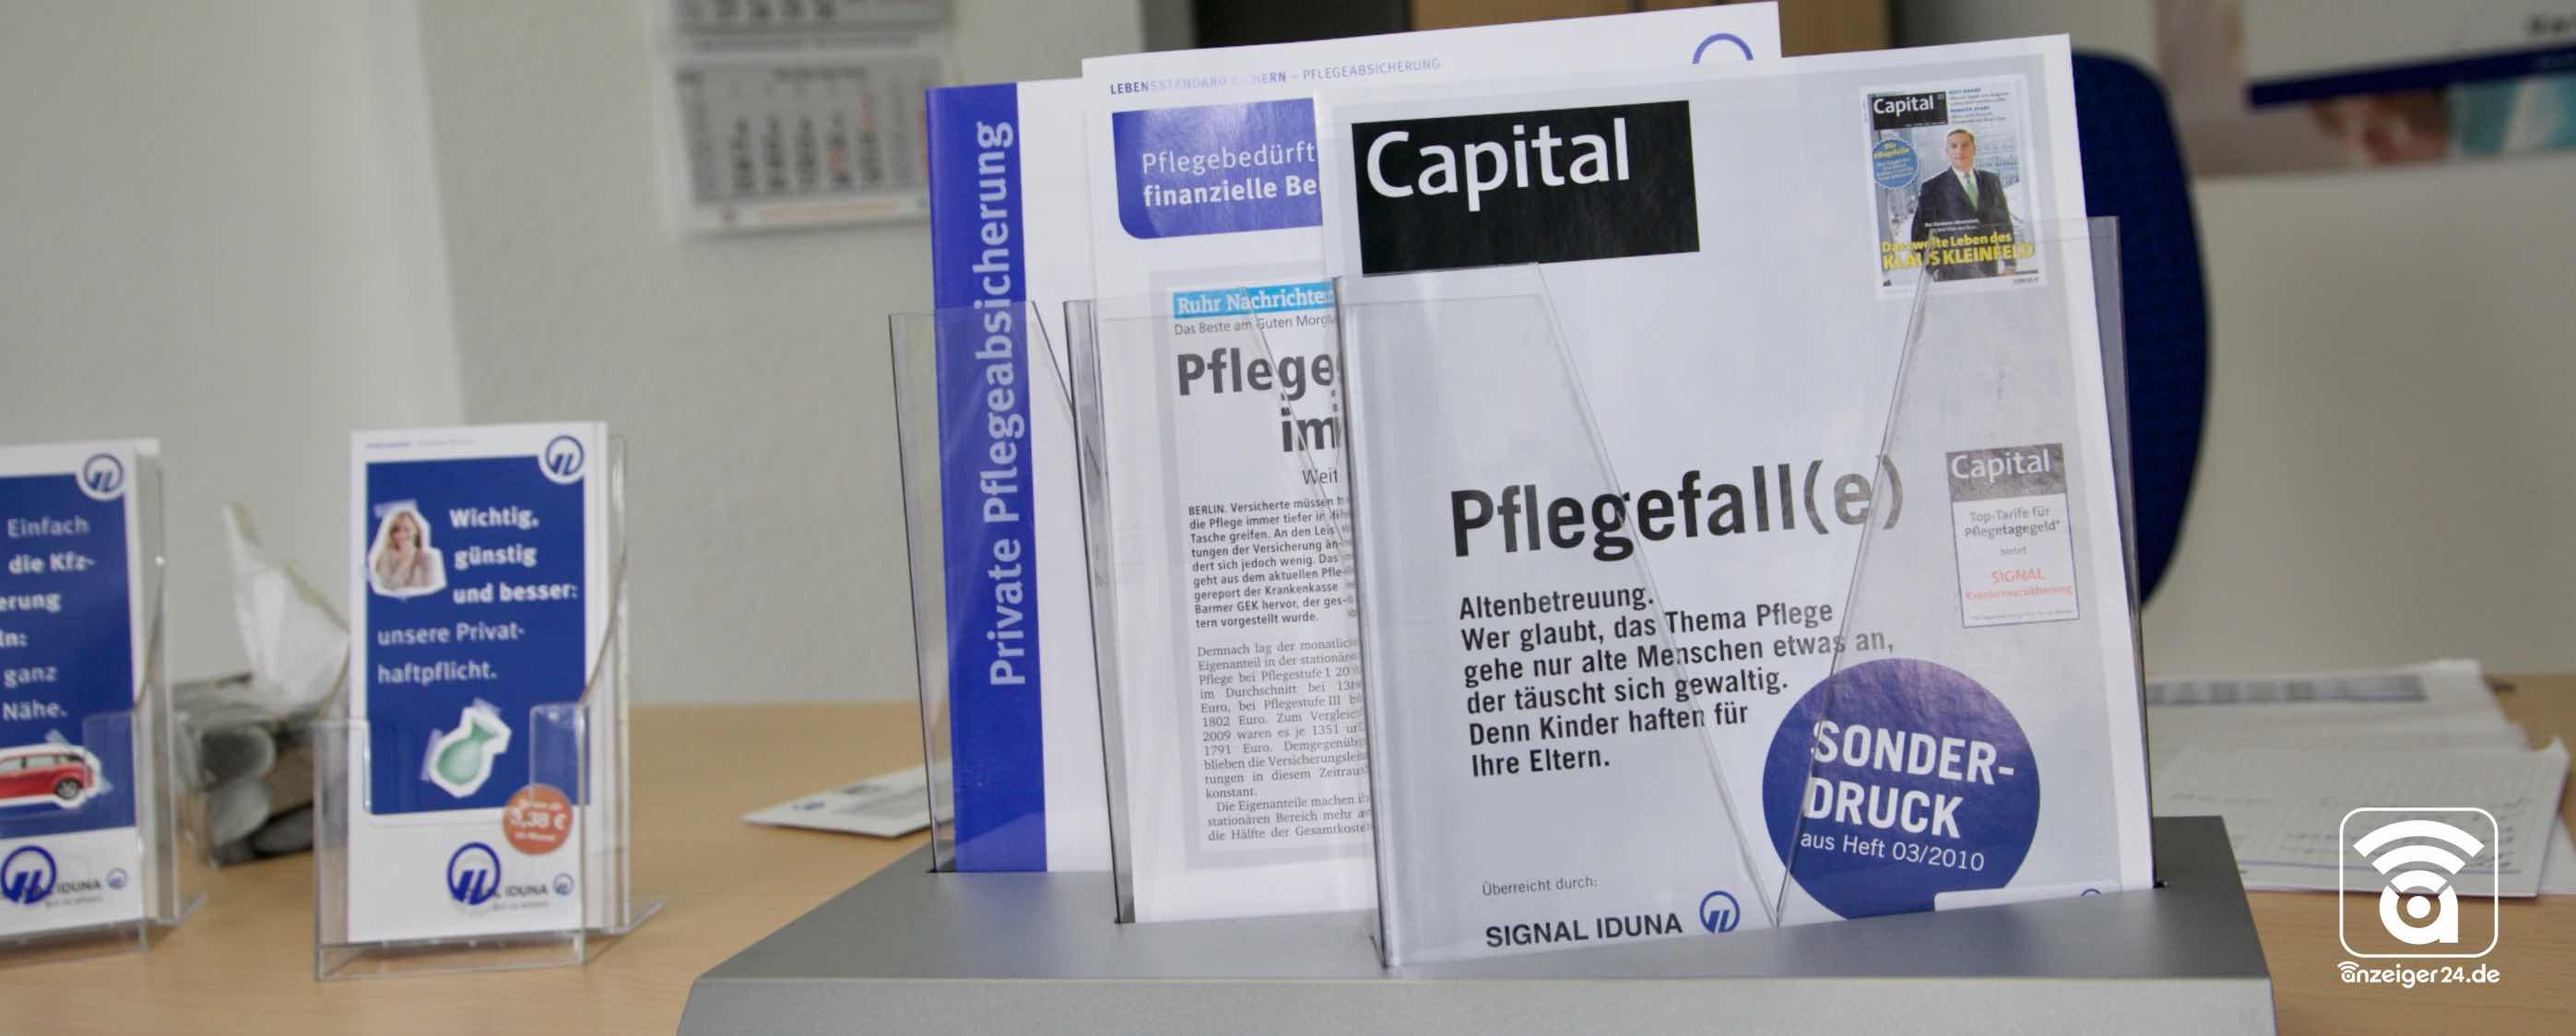 signal-iduna-thomas-peckhaus-hilden-versicherung